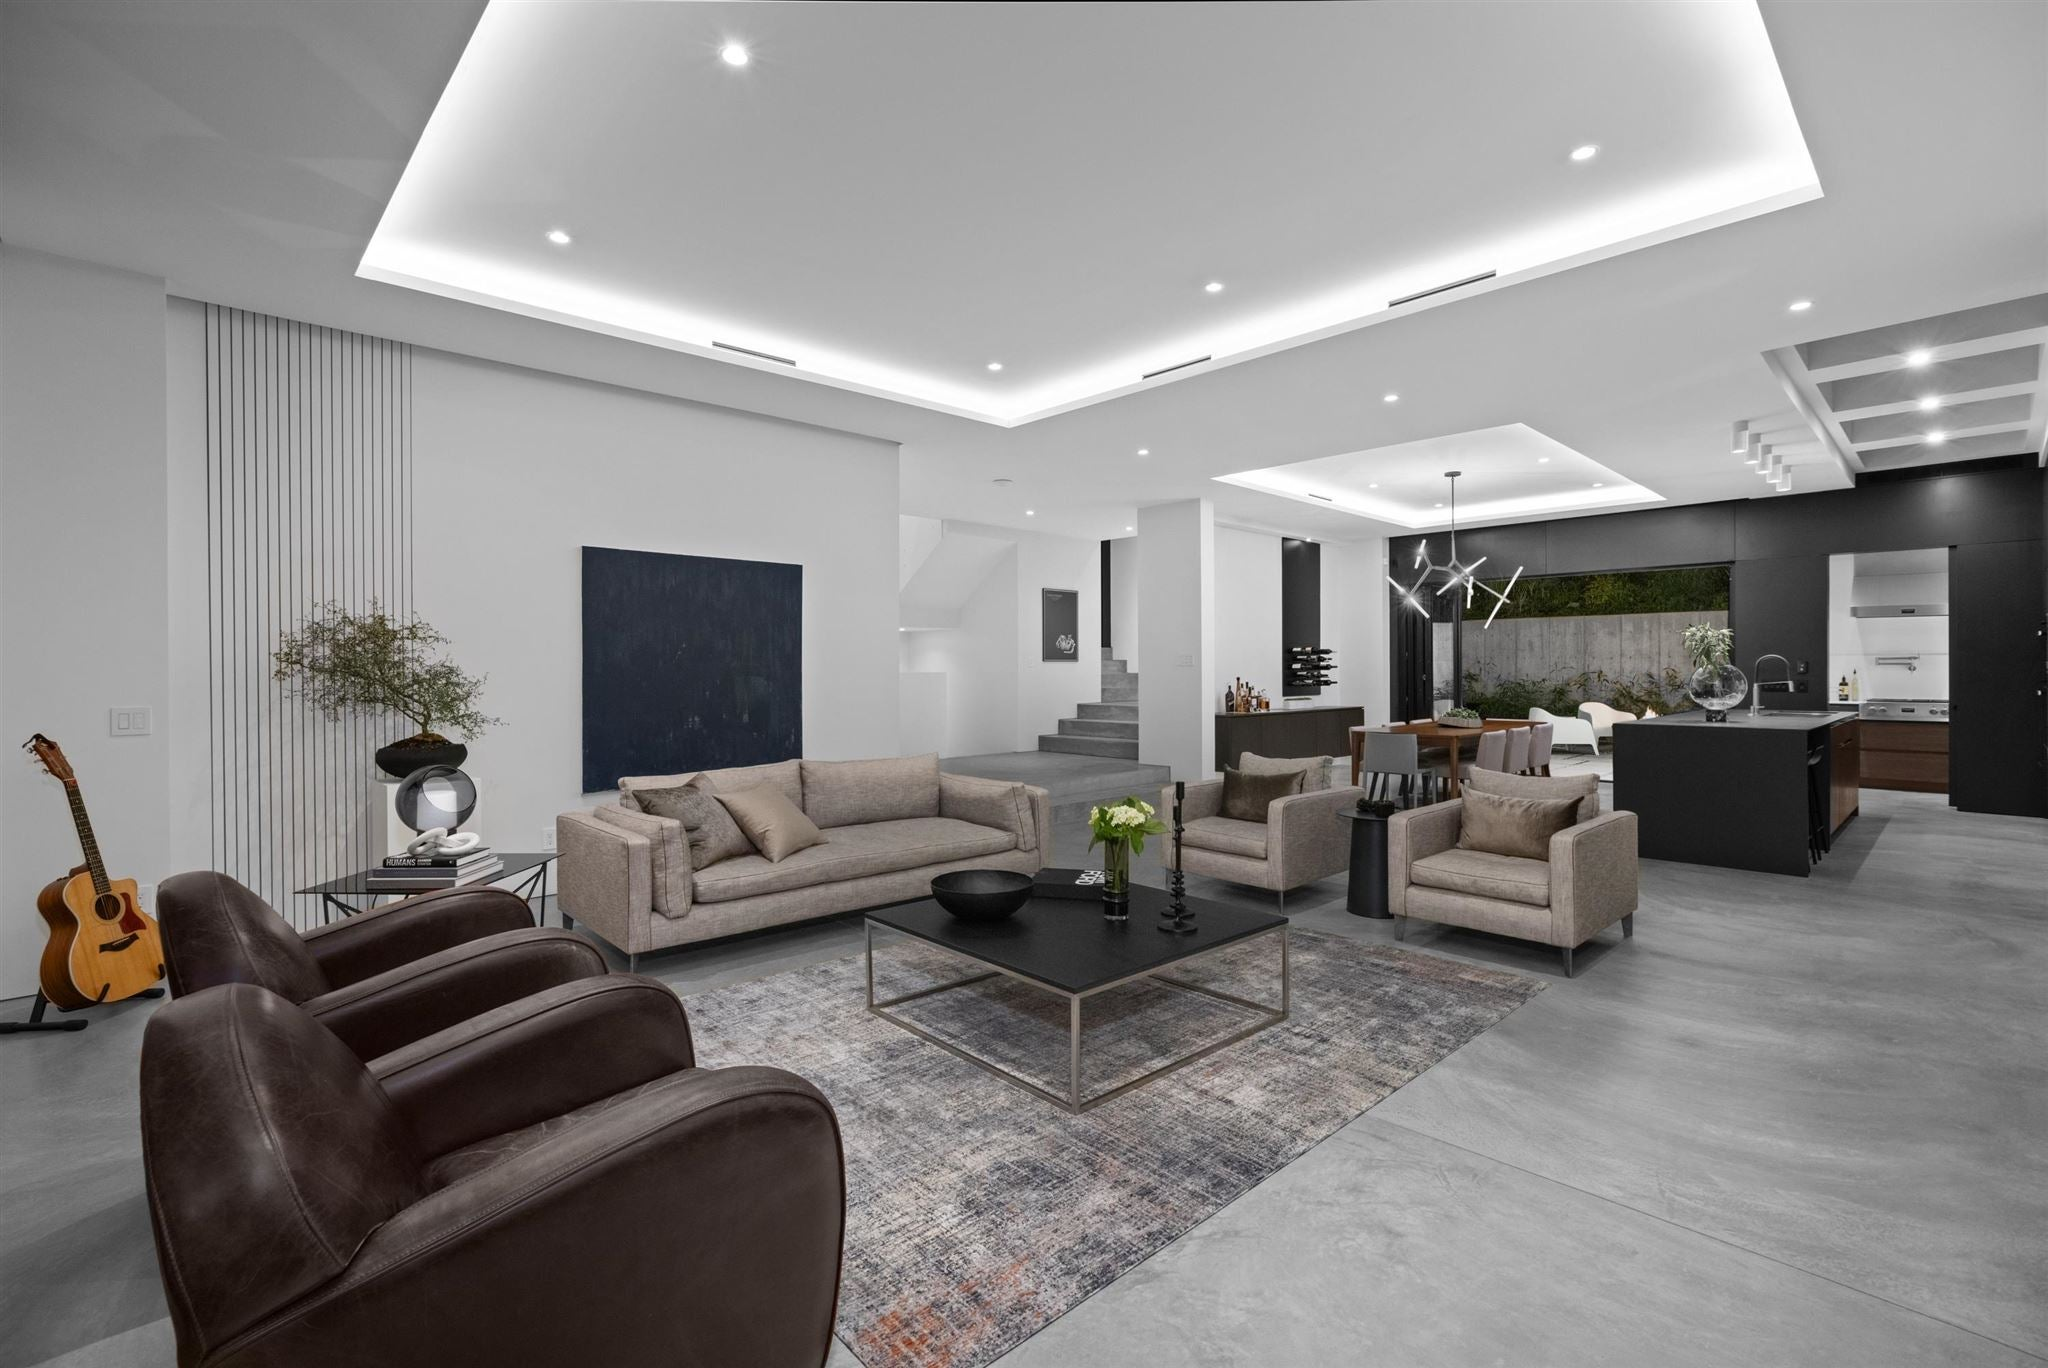 276 SANDRINGHAM CRESCENT - Upper Lonsdale House/Single Family for sale, 7 Bedrooms (R2617703) - #11